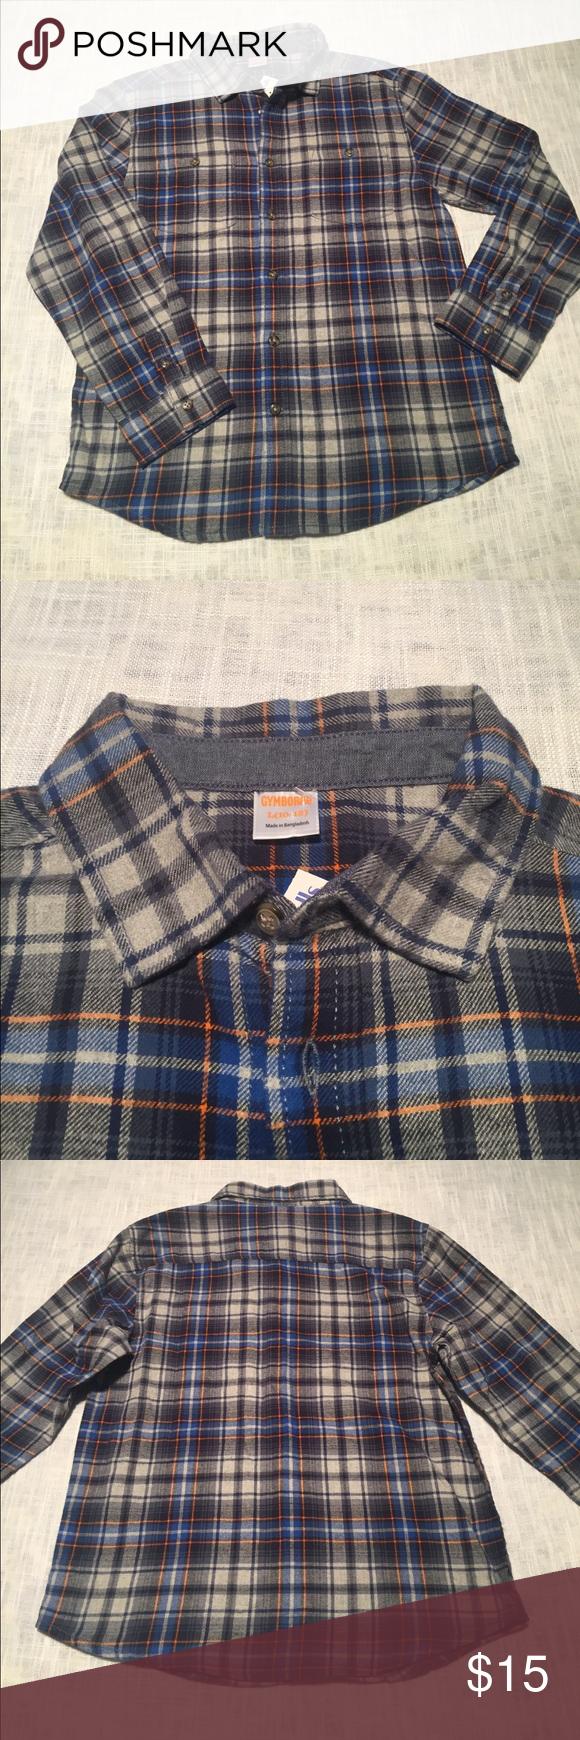 Flannel shirt black and grey  NWT Gymboree flannel shirt NWT  Gymboree Flannel shirts and Plaid